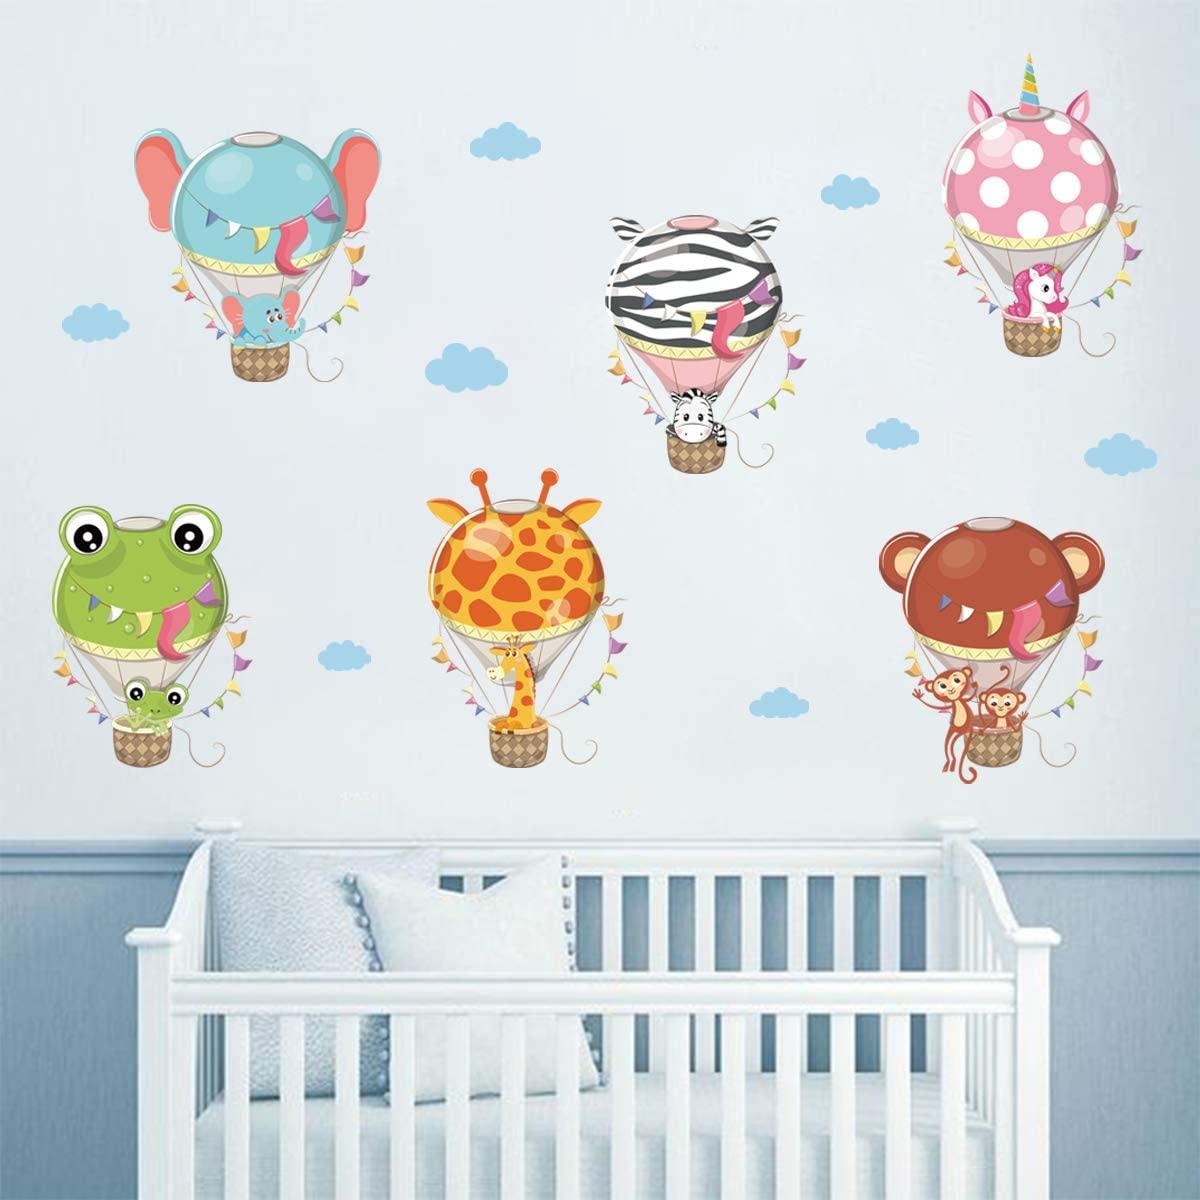 ufengke Animal Hot Air Balloon Wall Stickers Unicorn Giraffe Elephant Wall Decals Art Decor for Kids Bedroom Nursery Living Room